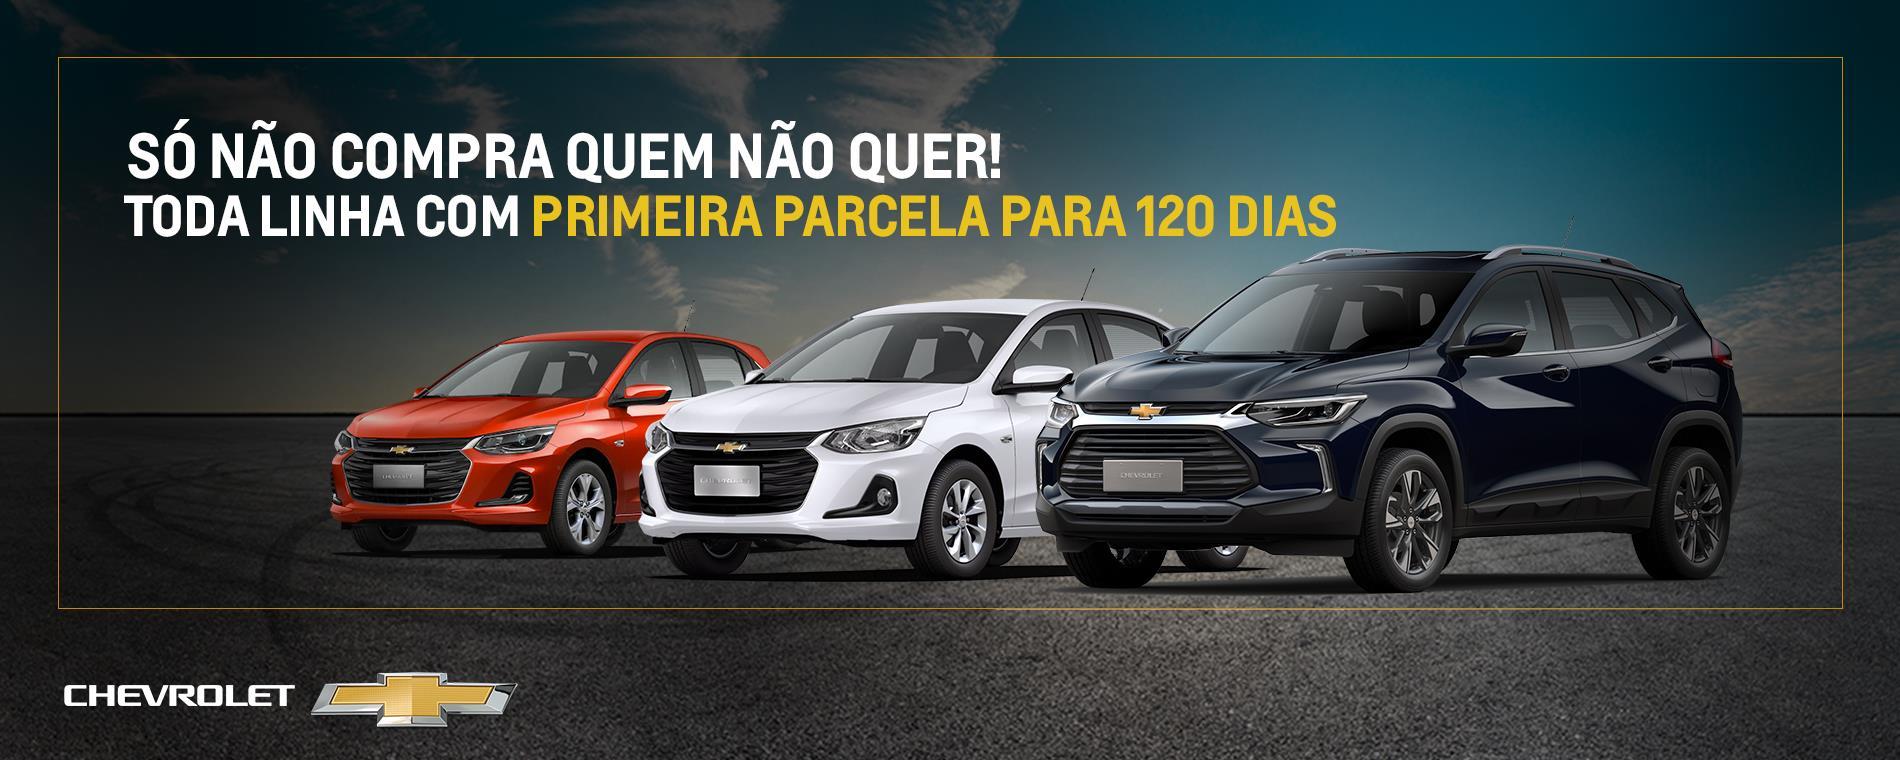 11_Dao-Silveira_Banner